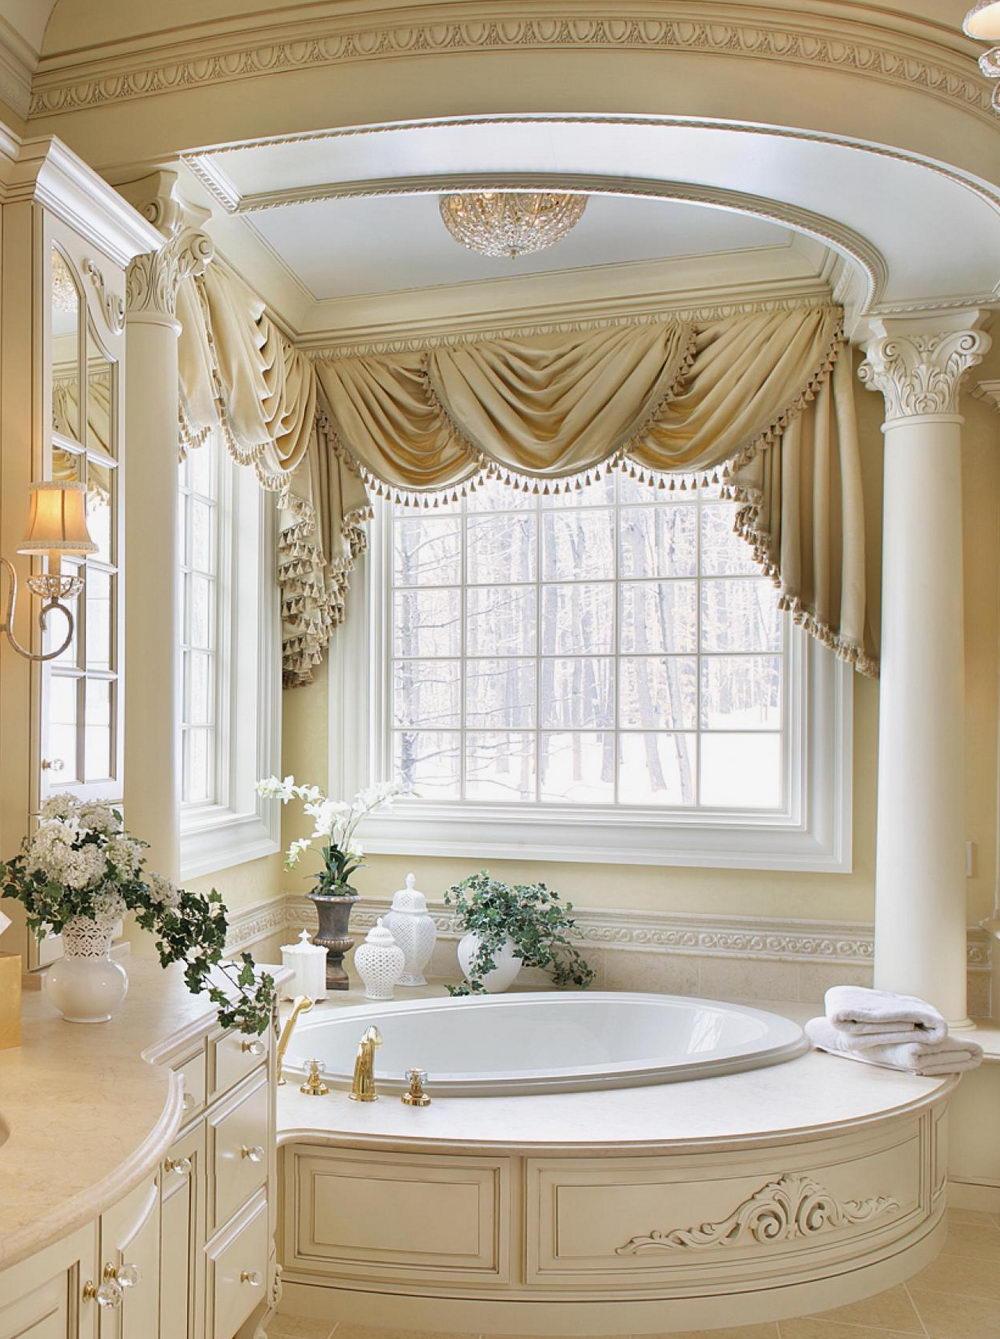 Bathroom Window Curtains - How to Buy - DecorIdeasBathroom ...